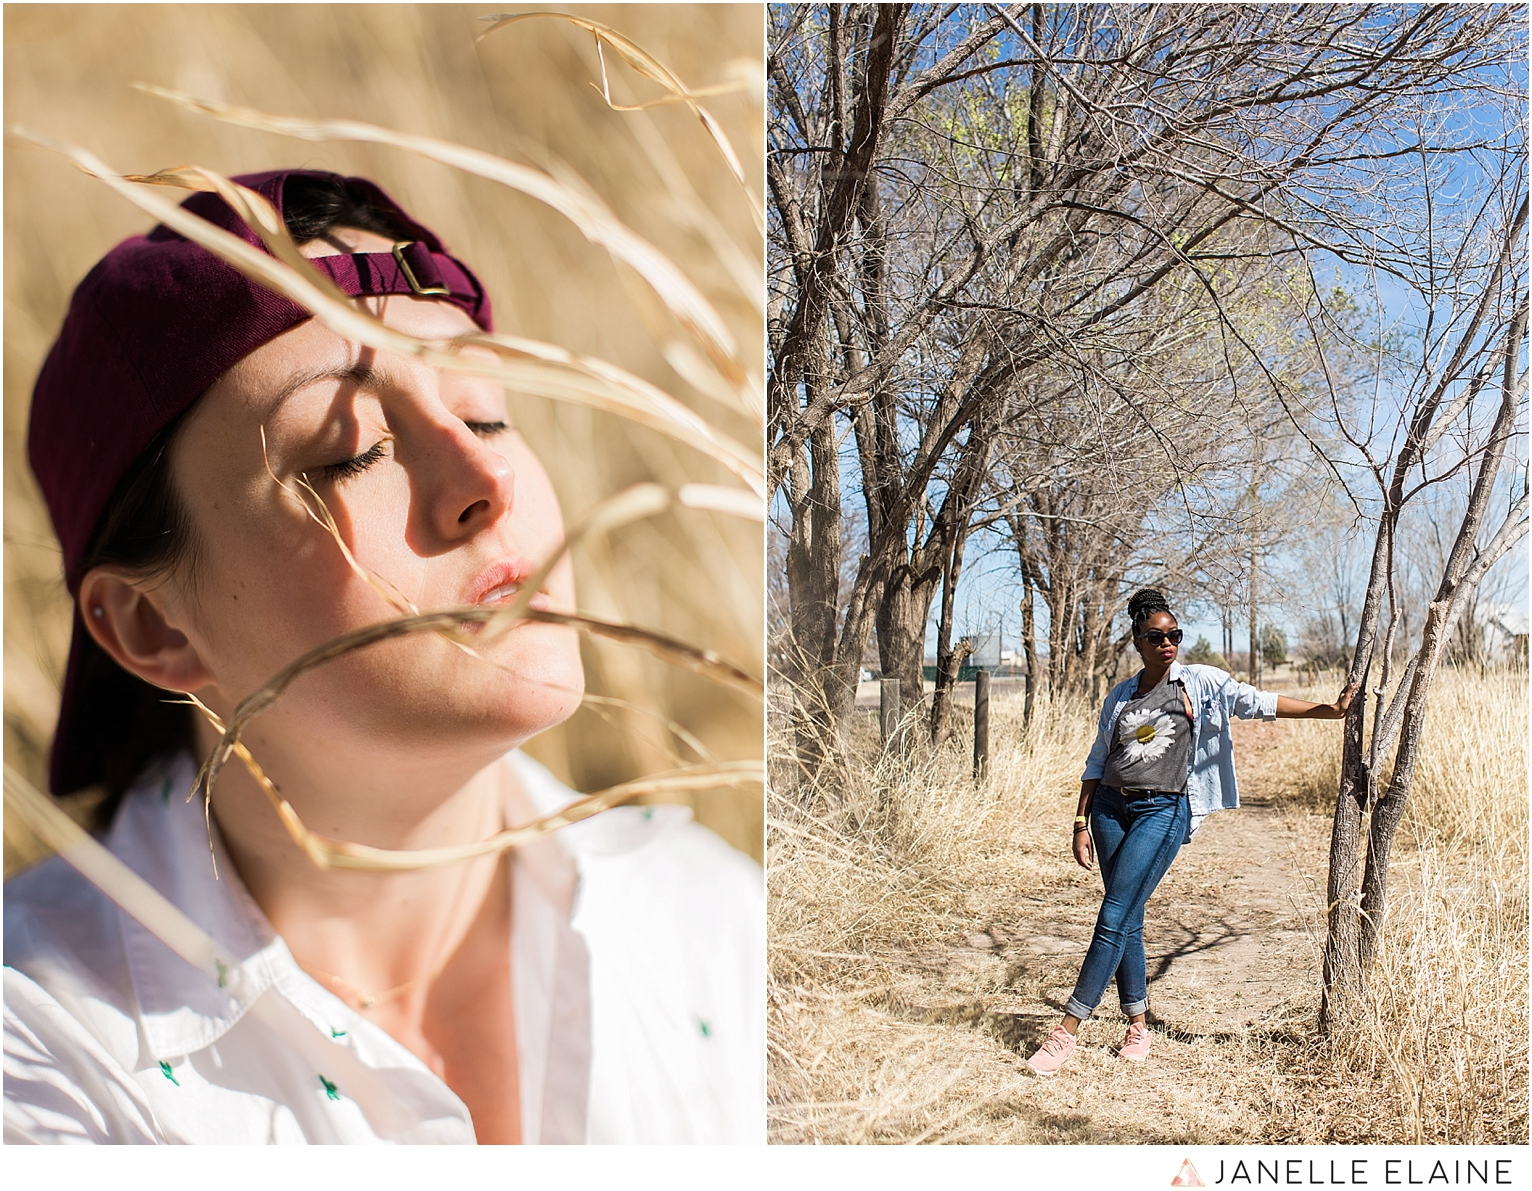 yeah field trip-el cosmico-marfa texas-janelle elaine photography-10.jpg